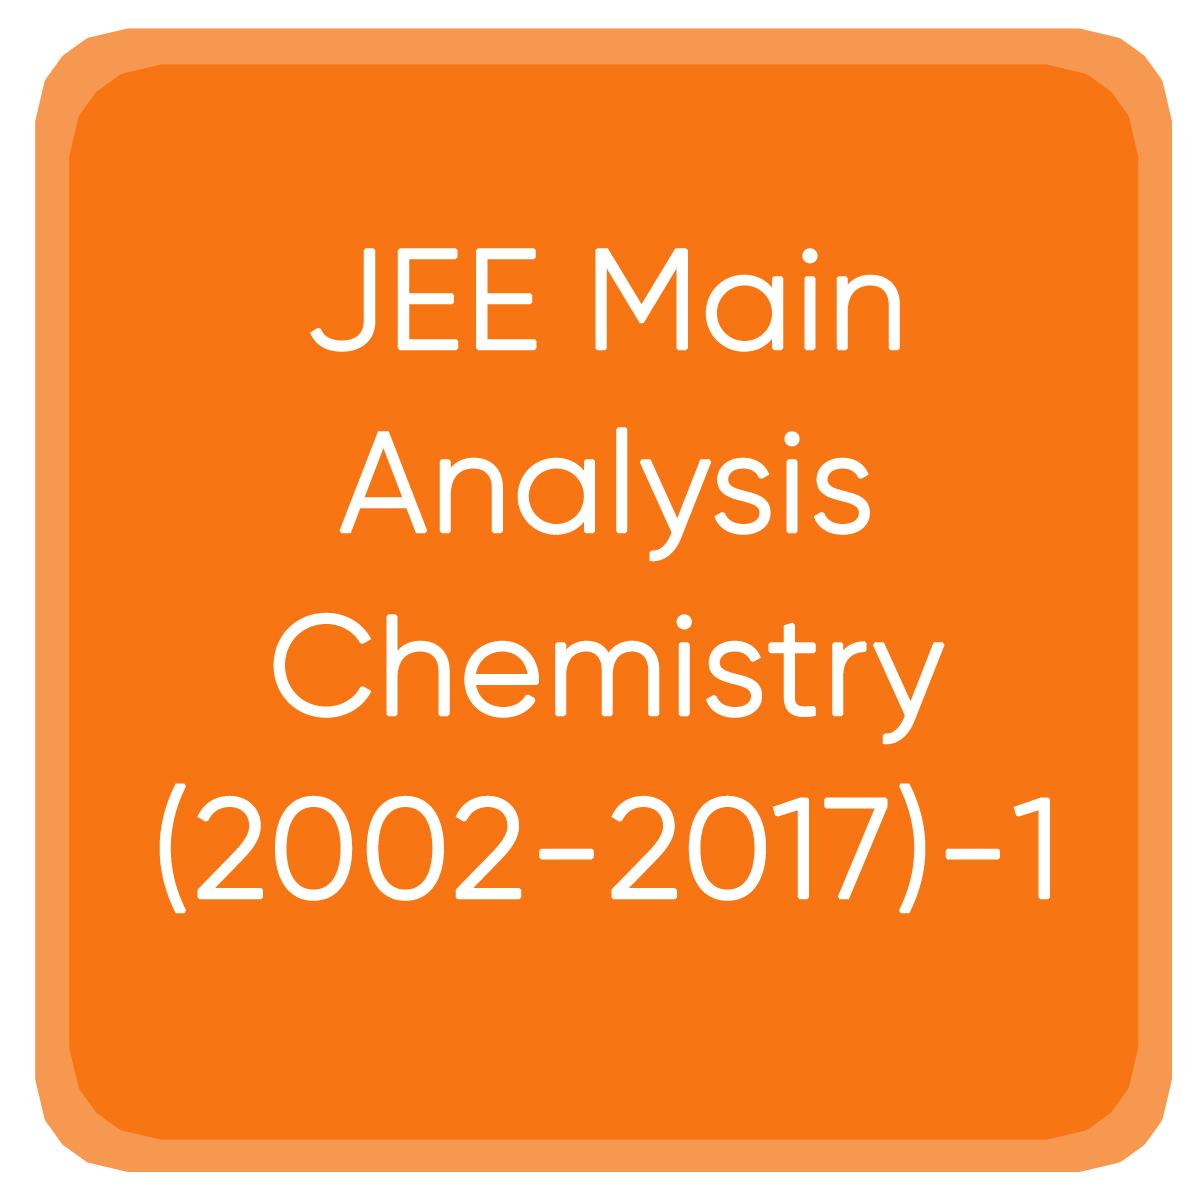 JEE Main Analysis Chemistry (2002-2017)-1